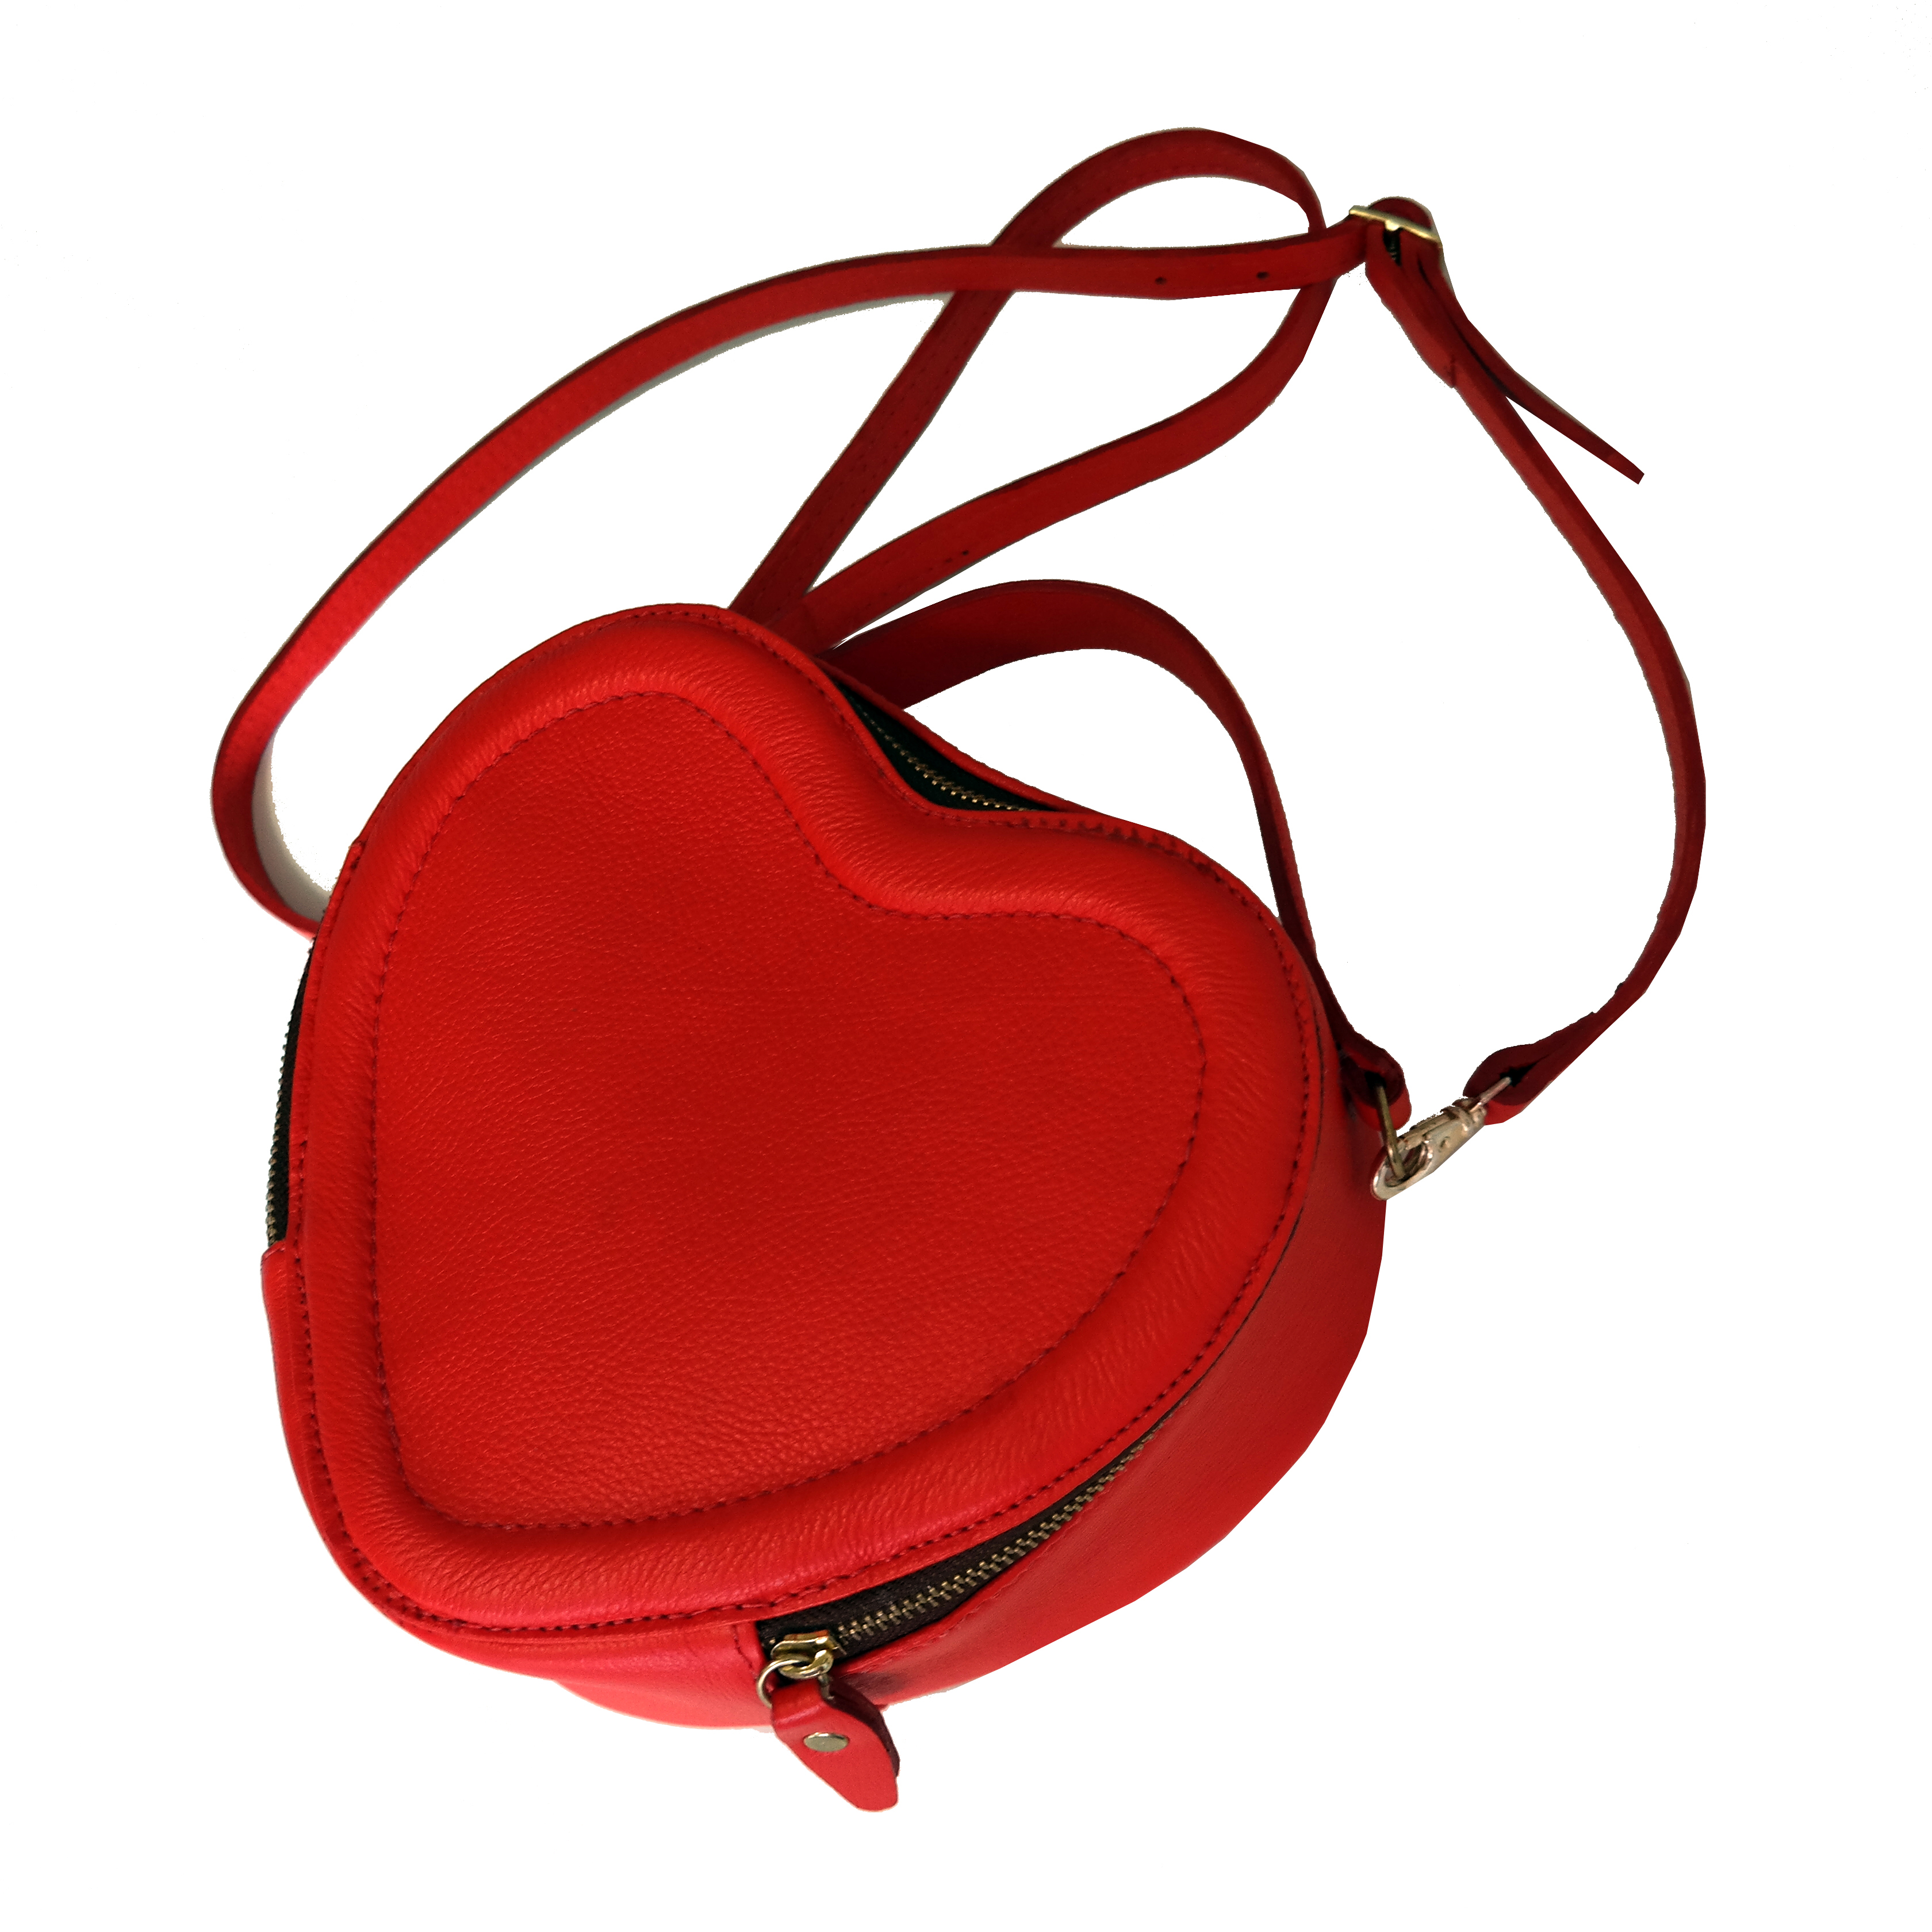 Bolsa Couro Heart Bag